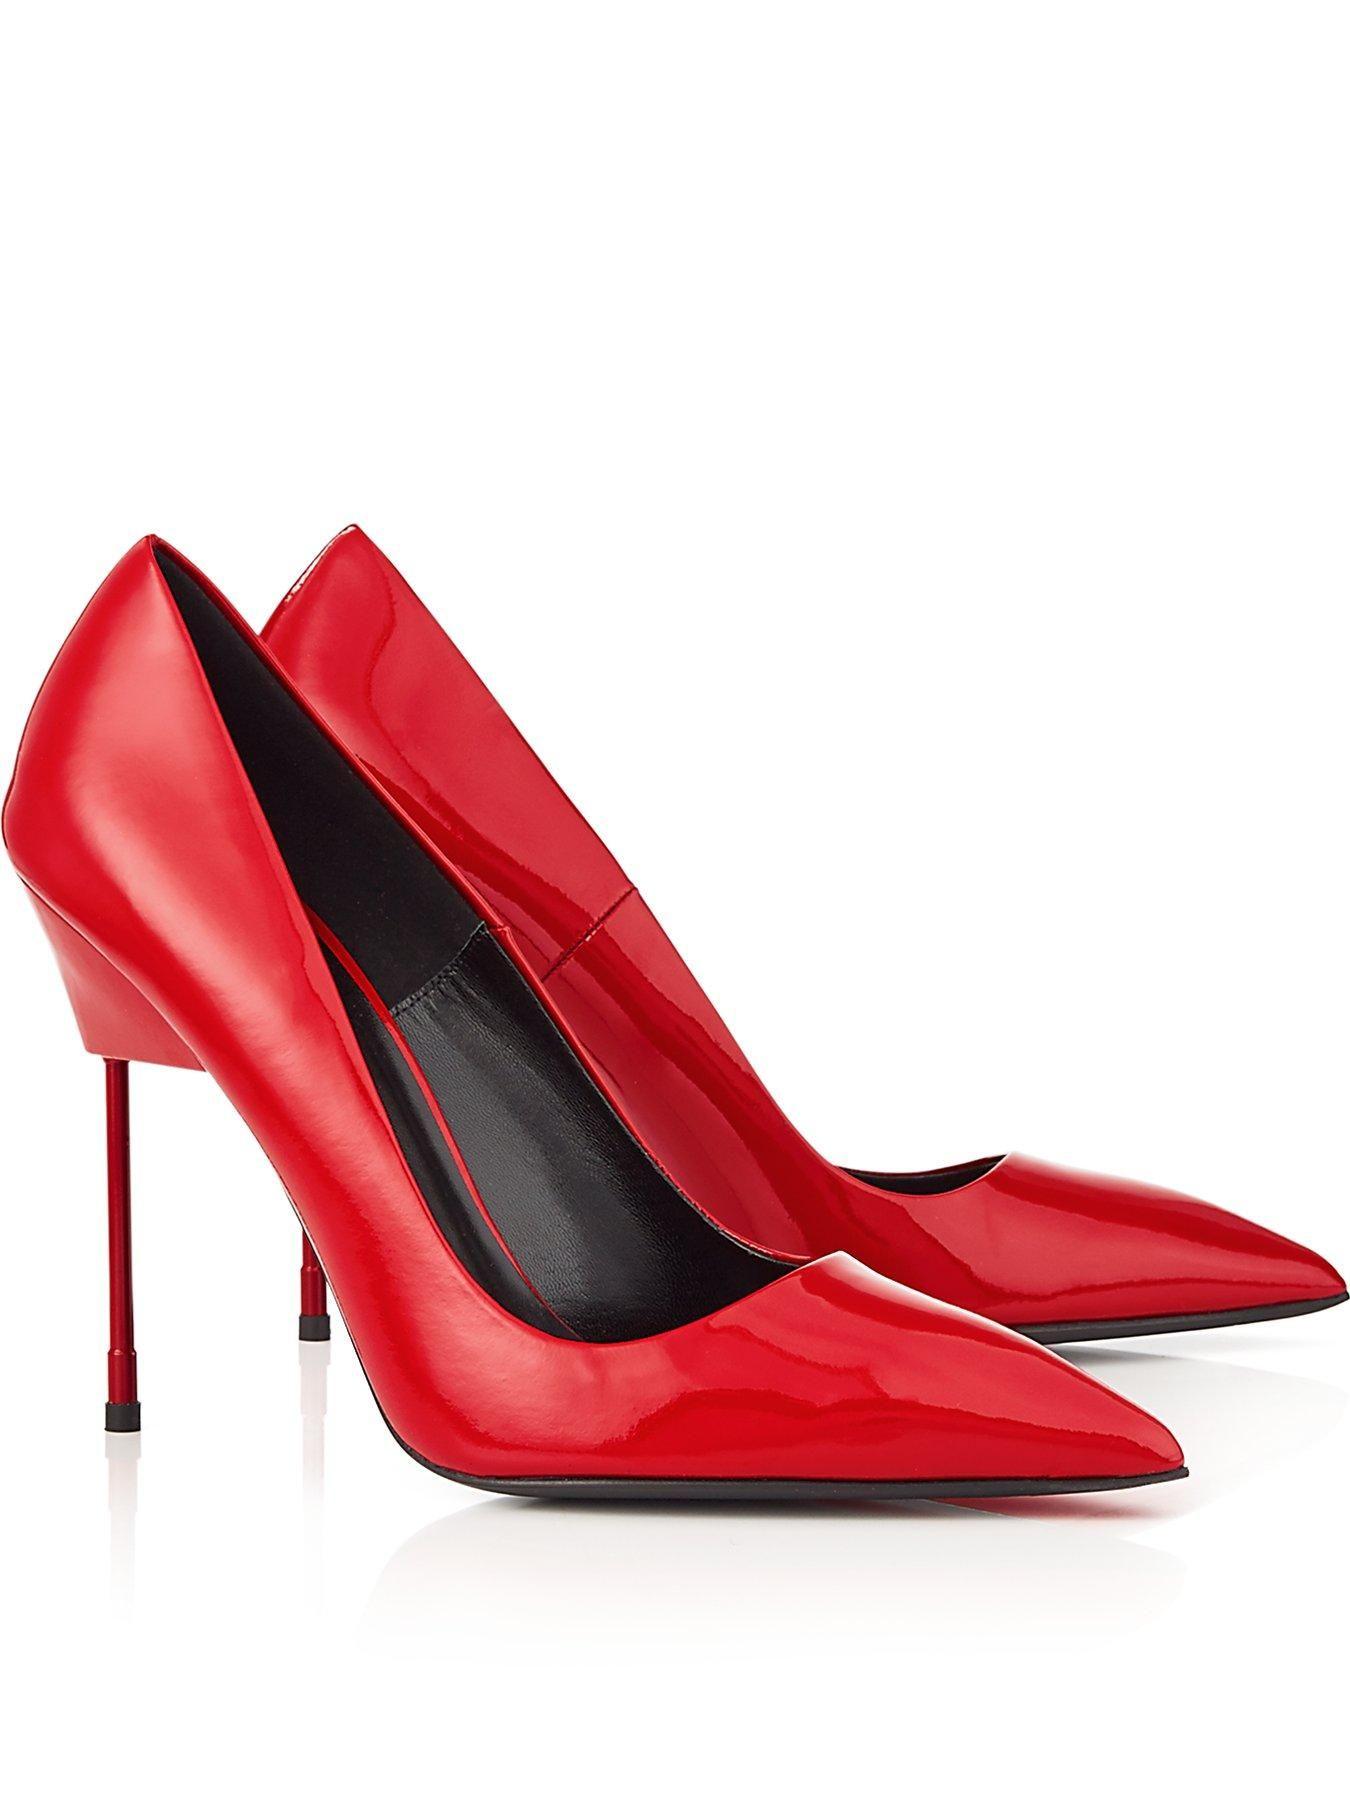 5452878229b Exclusive | www.very.co.uk | A heels 1 shoes women | Red stilettos ...